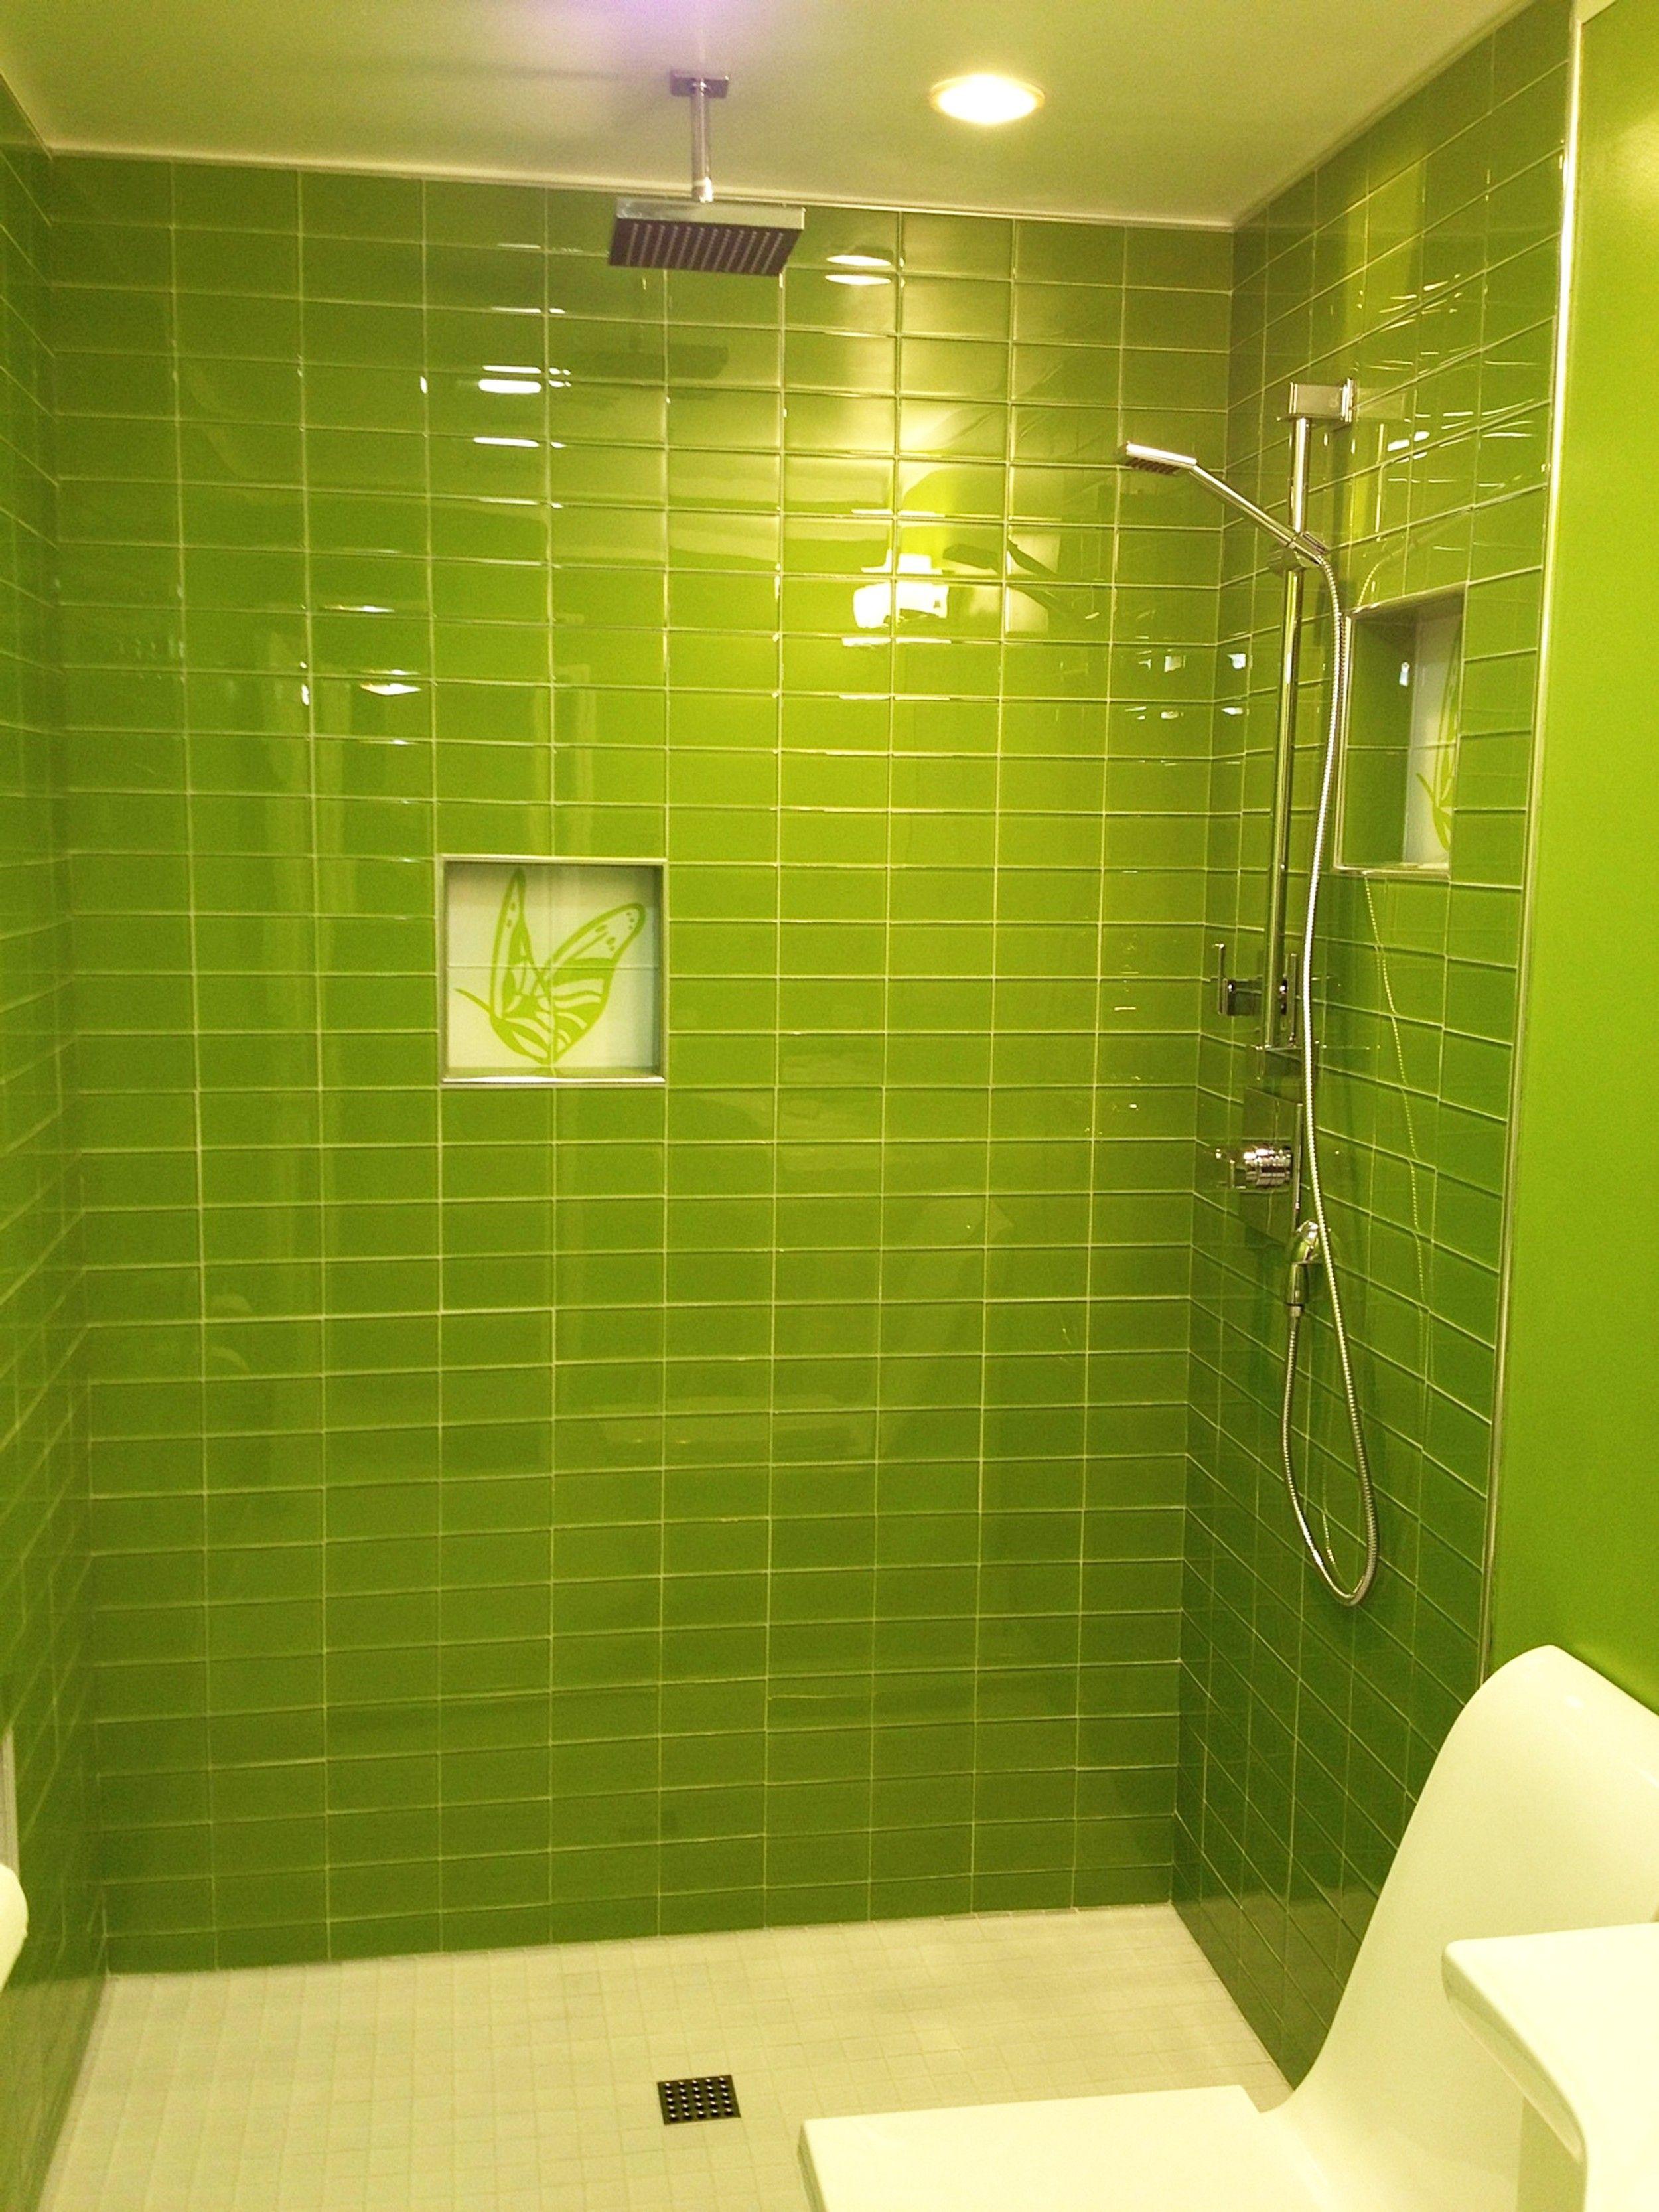 Lush Lemongrass 3x6 Green Glass Subway Tile Shower Installation